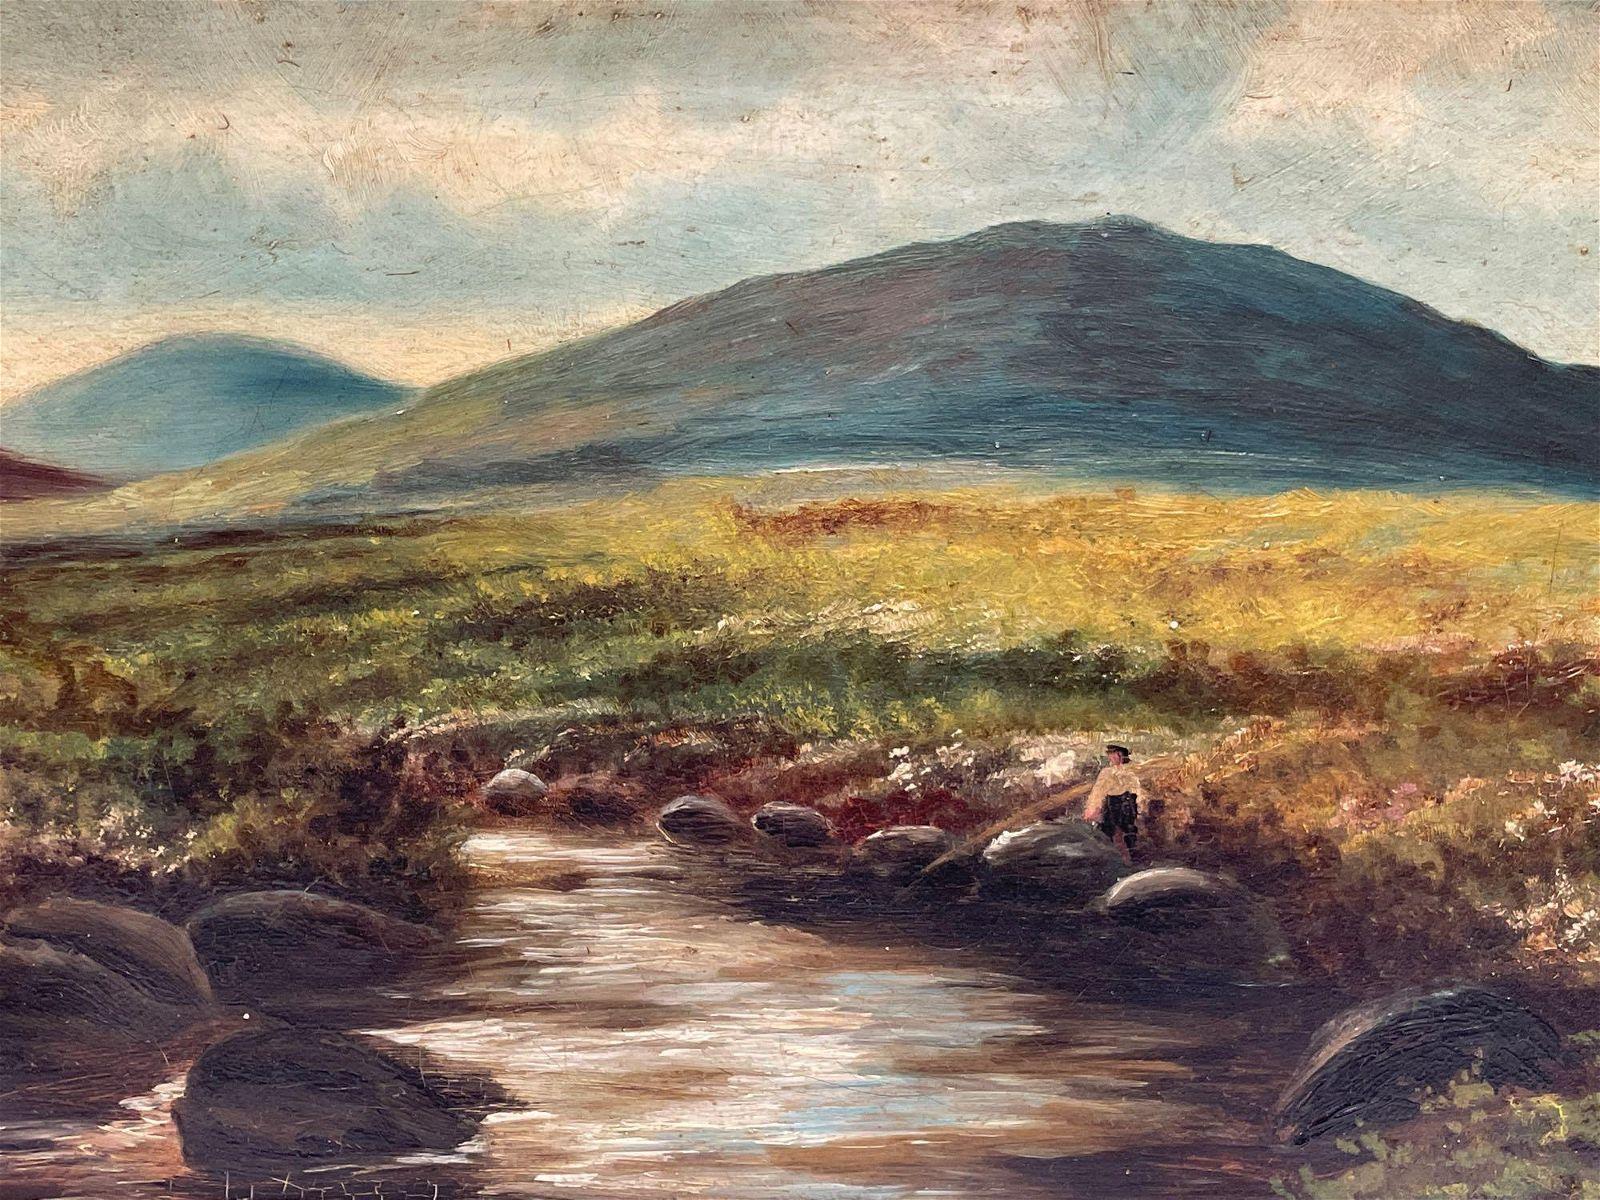 1919 European School River Landscape Oil Painting on